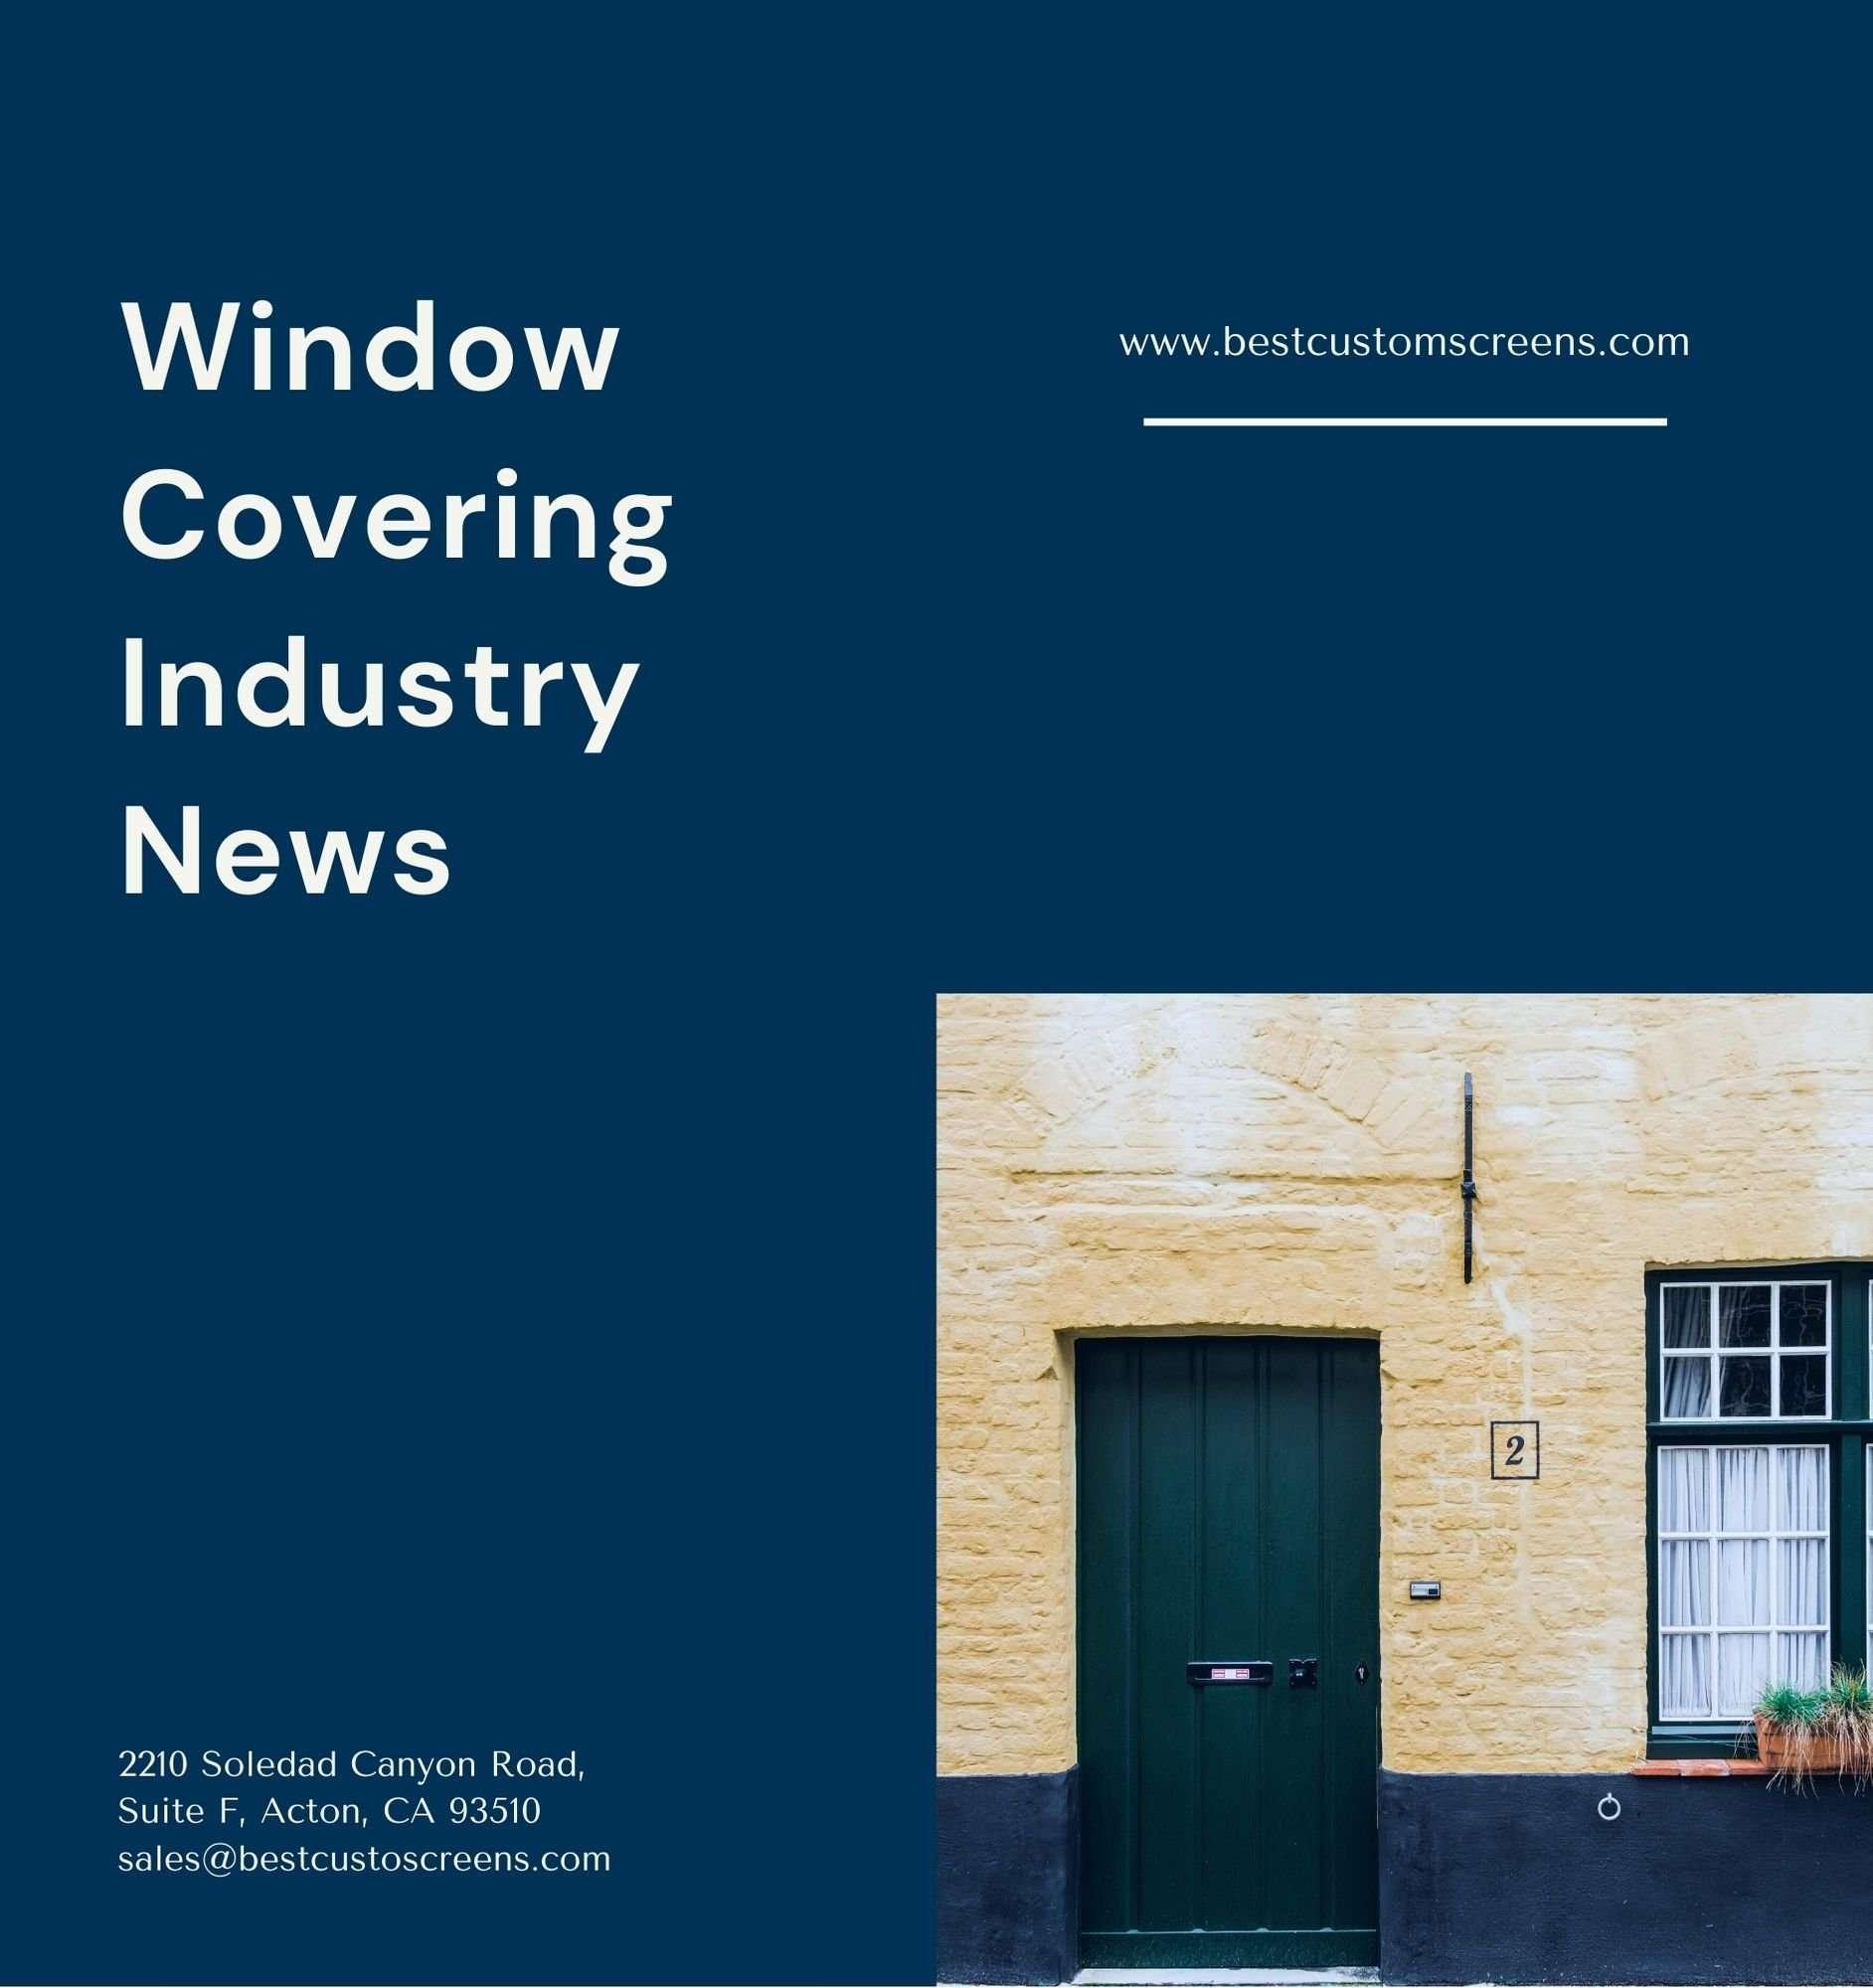 Wnodow covering industry news by Best Custom Screens